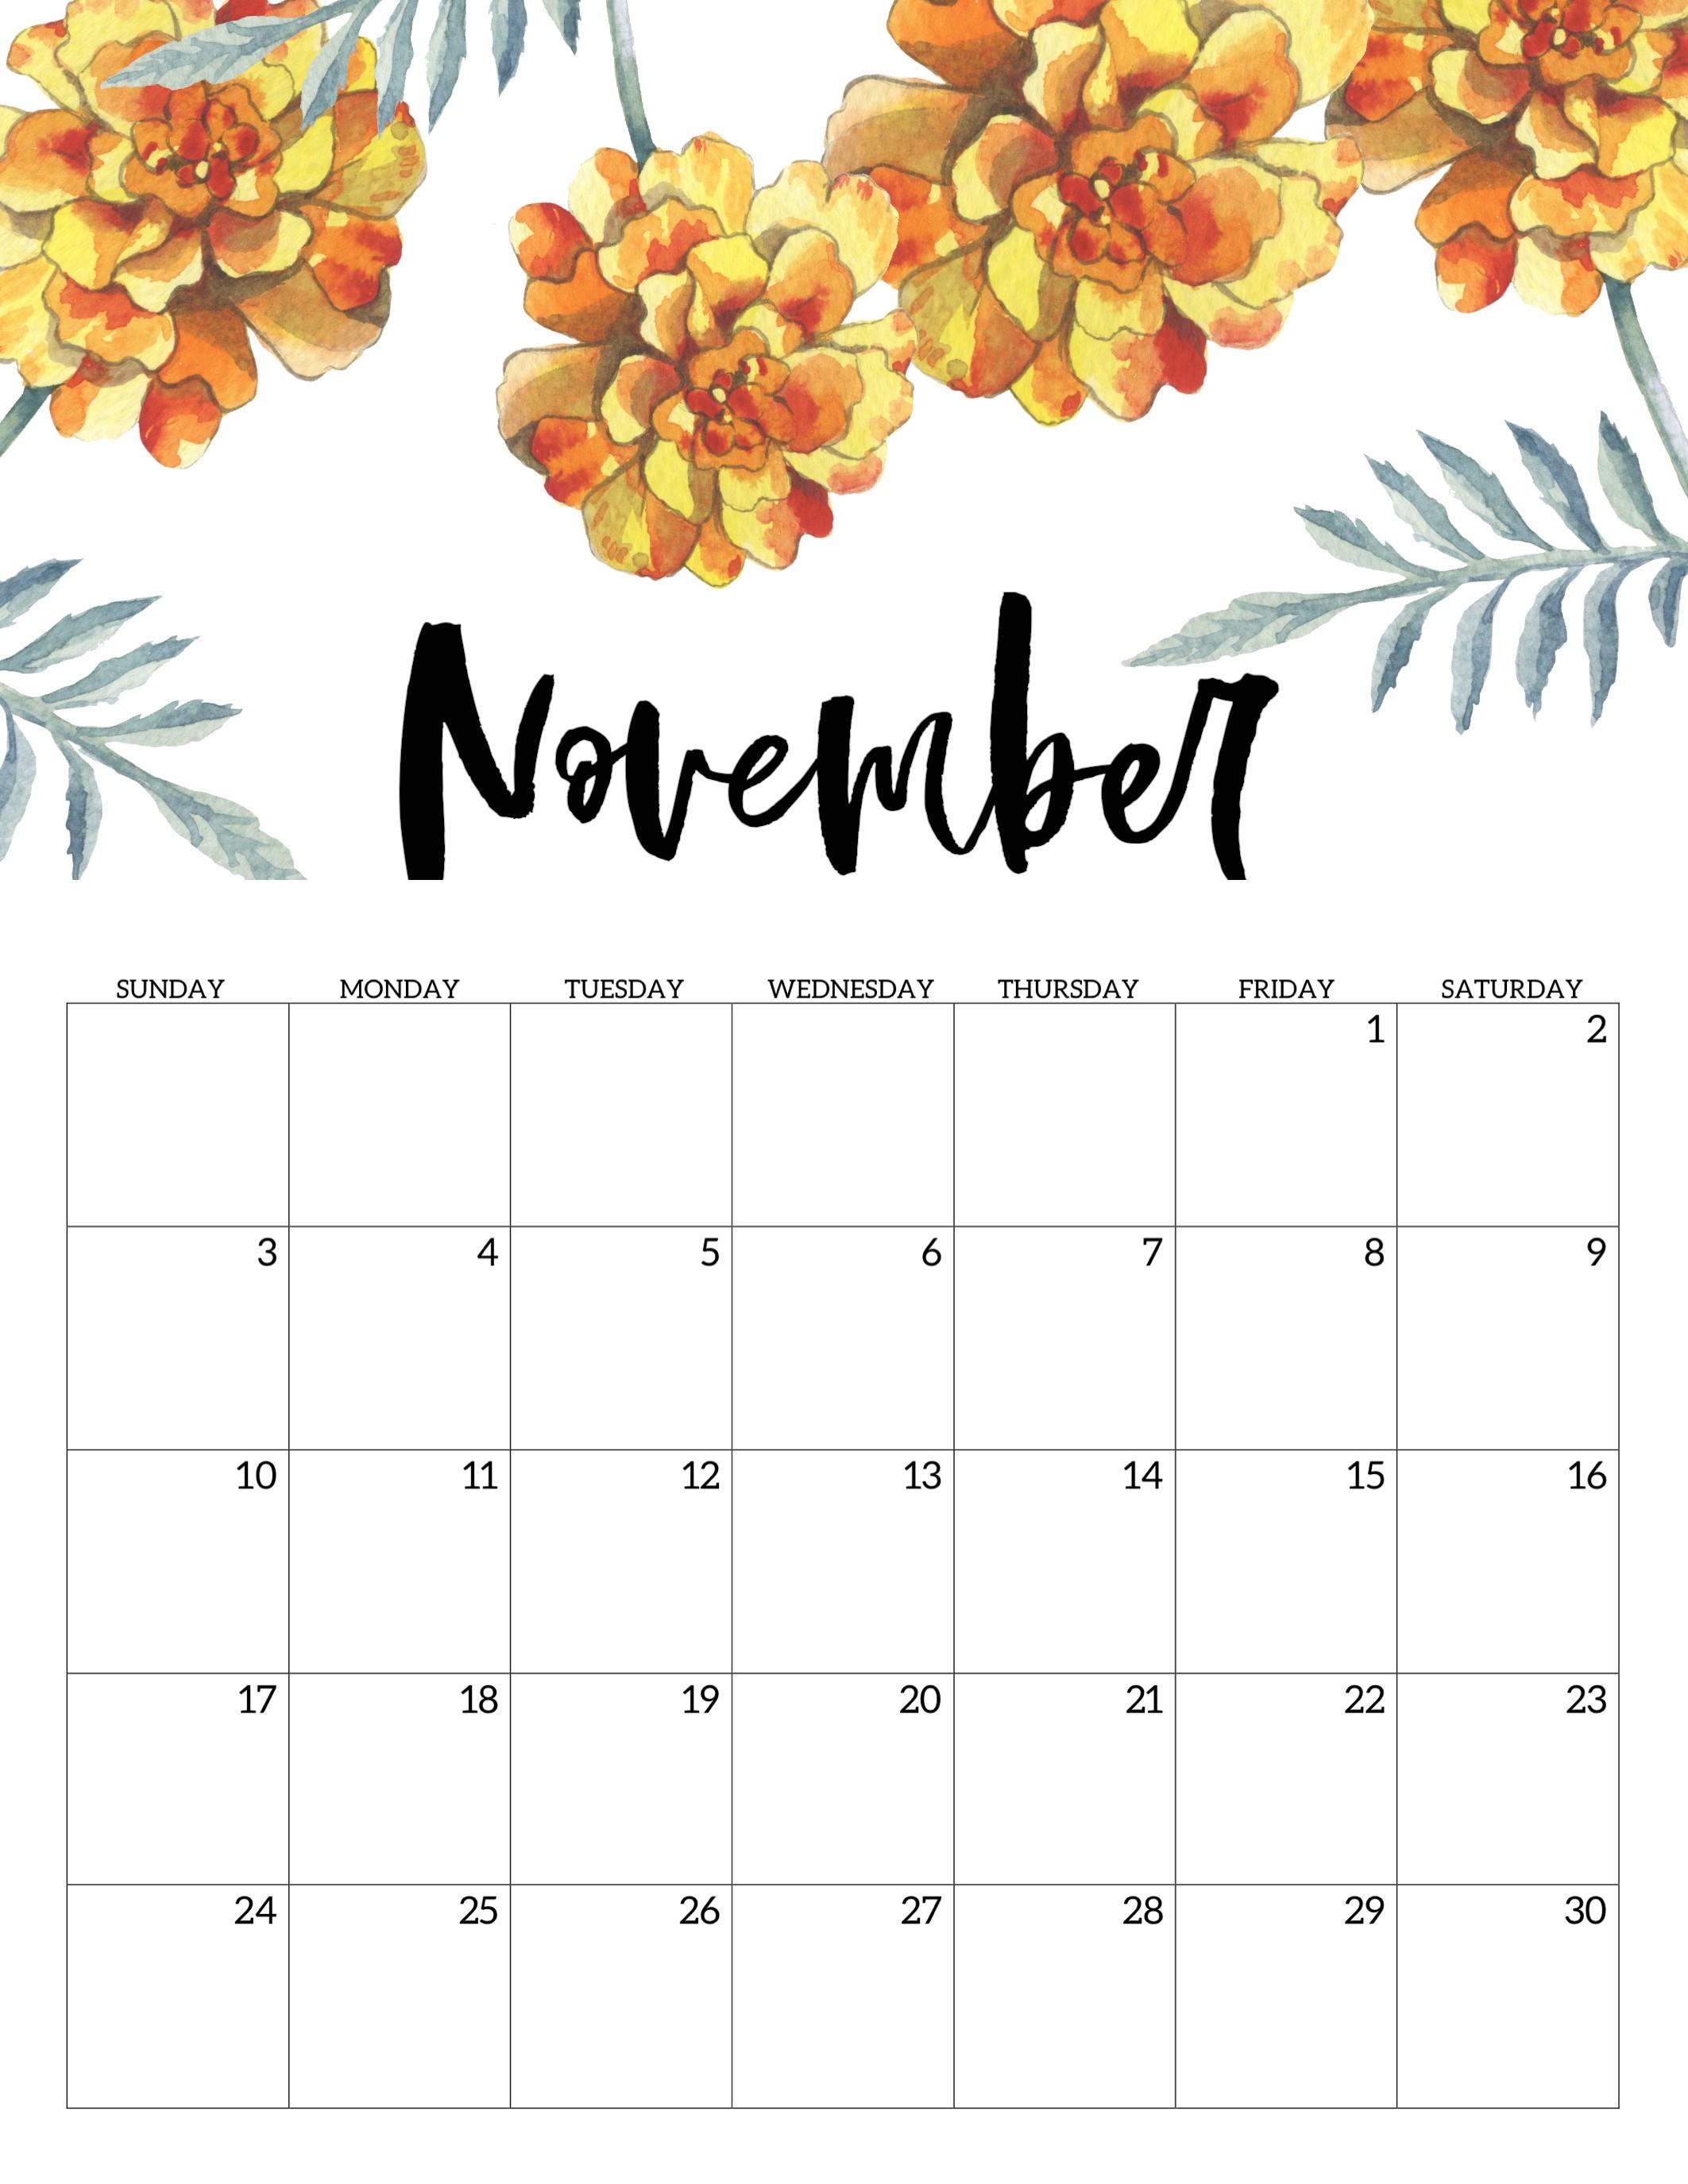 2019 November Printable Calendar Free Printable Calendar 2019 Floral Paper Trail Design